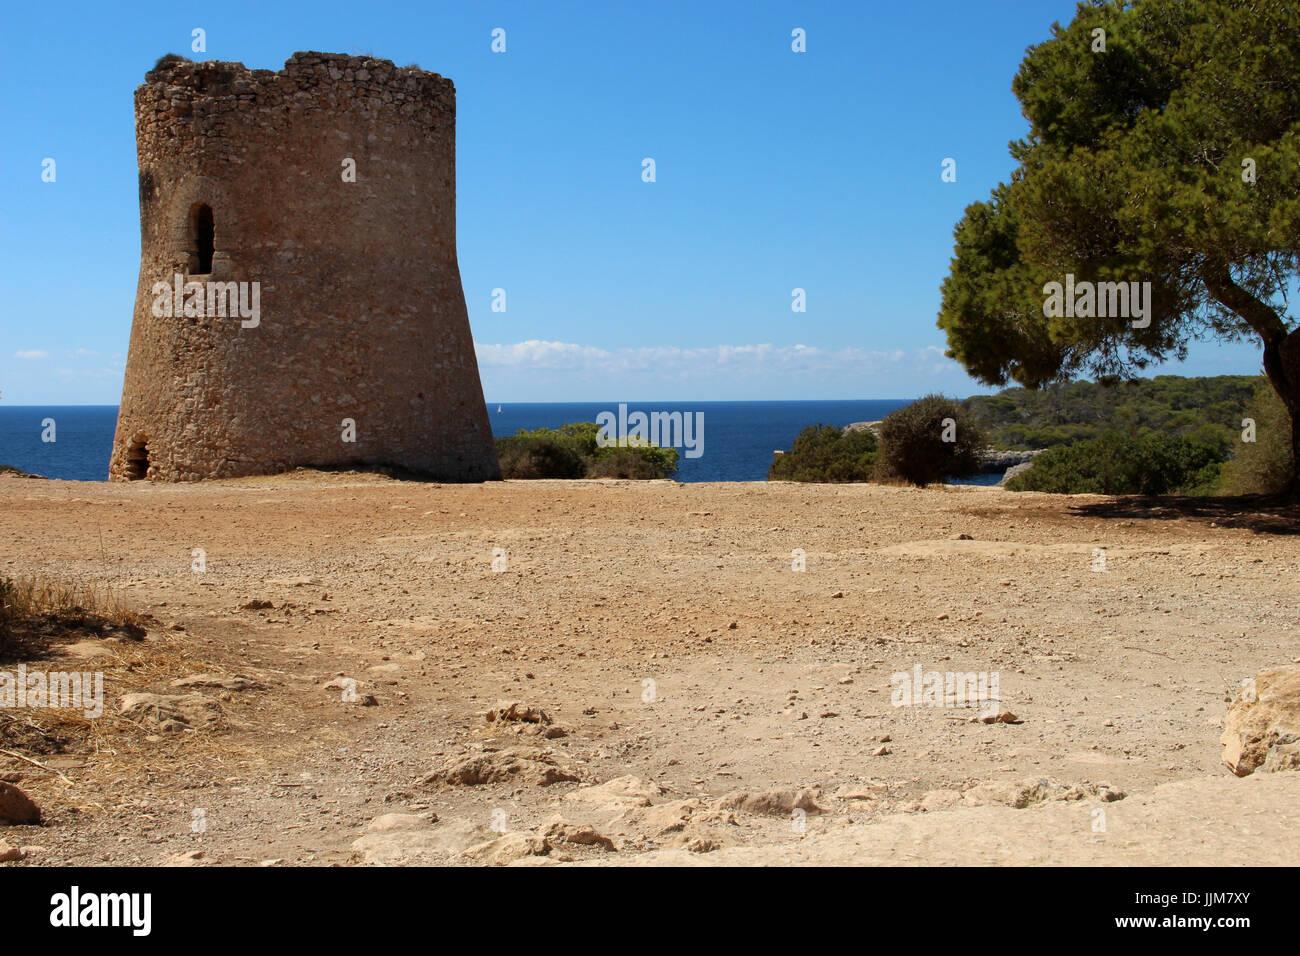 Two small sailing boots, Mediterranian Sea - Stock Image